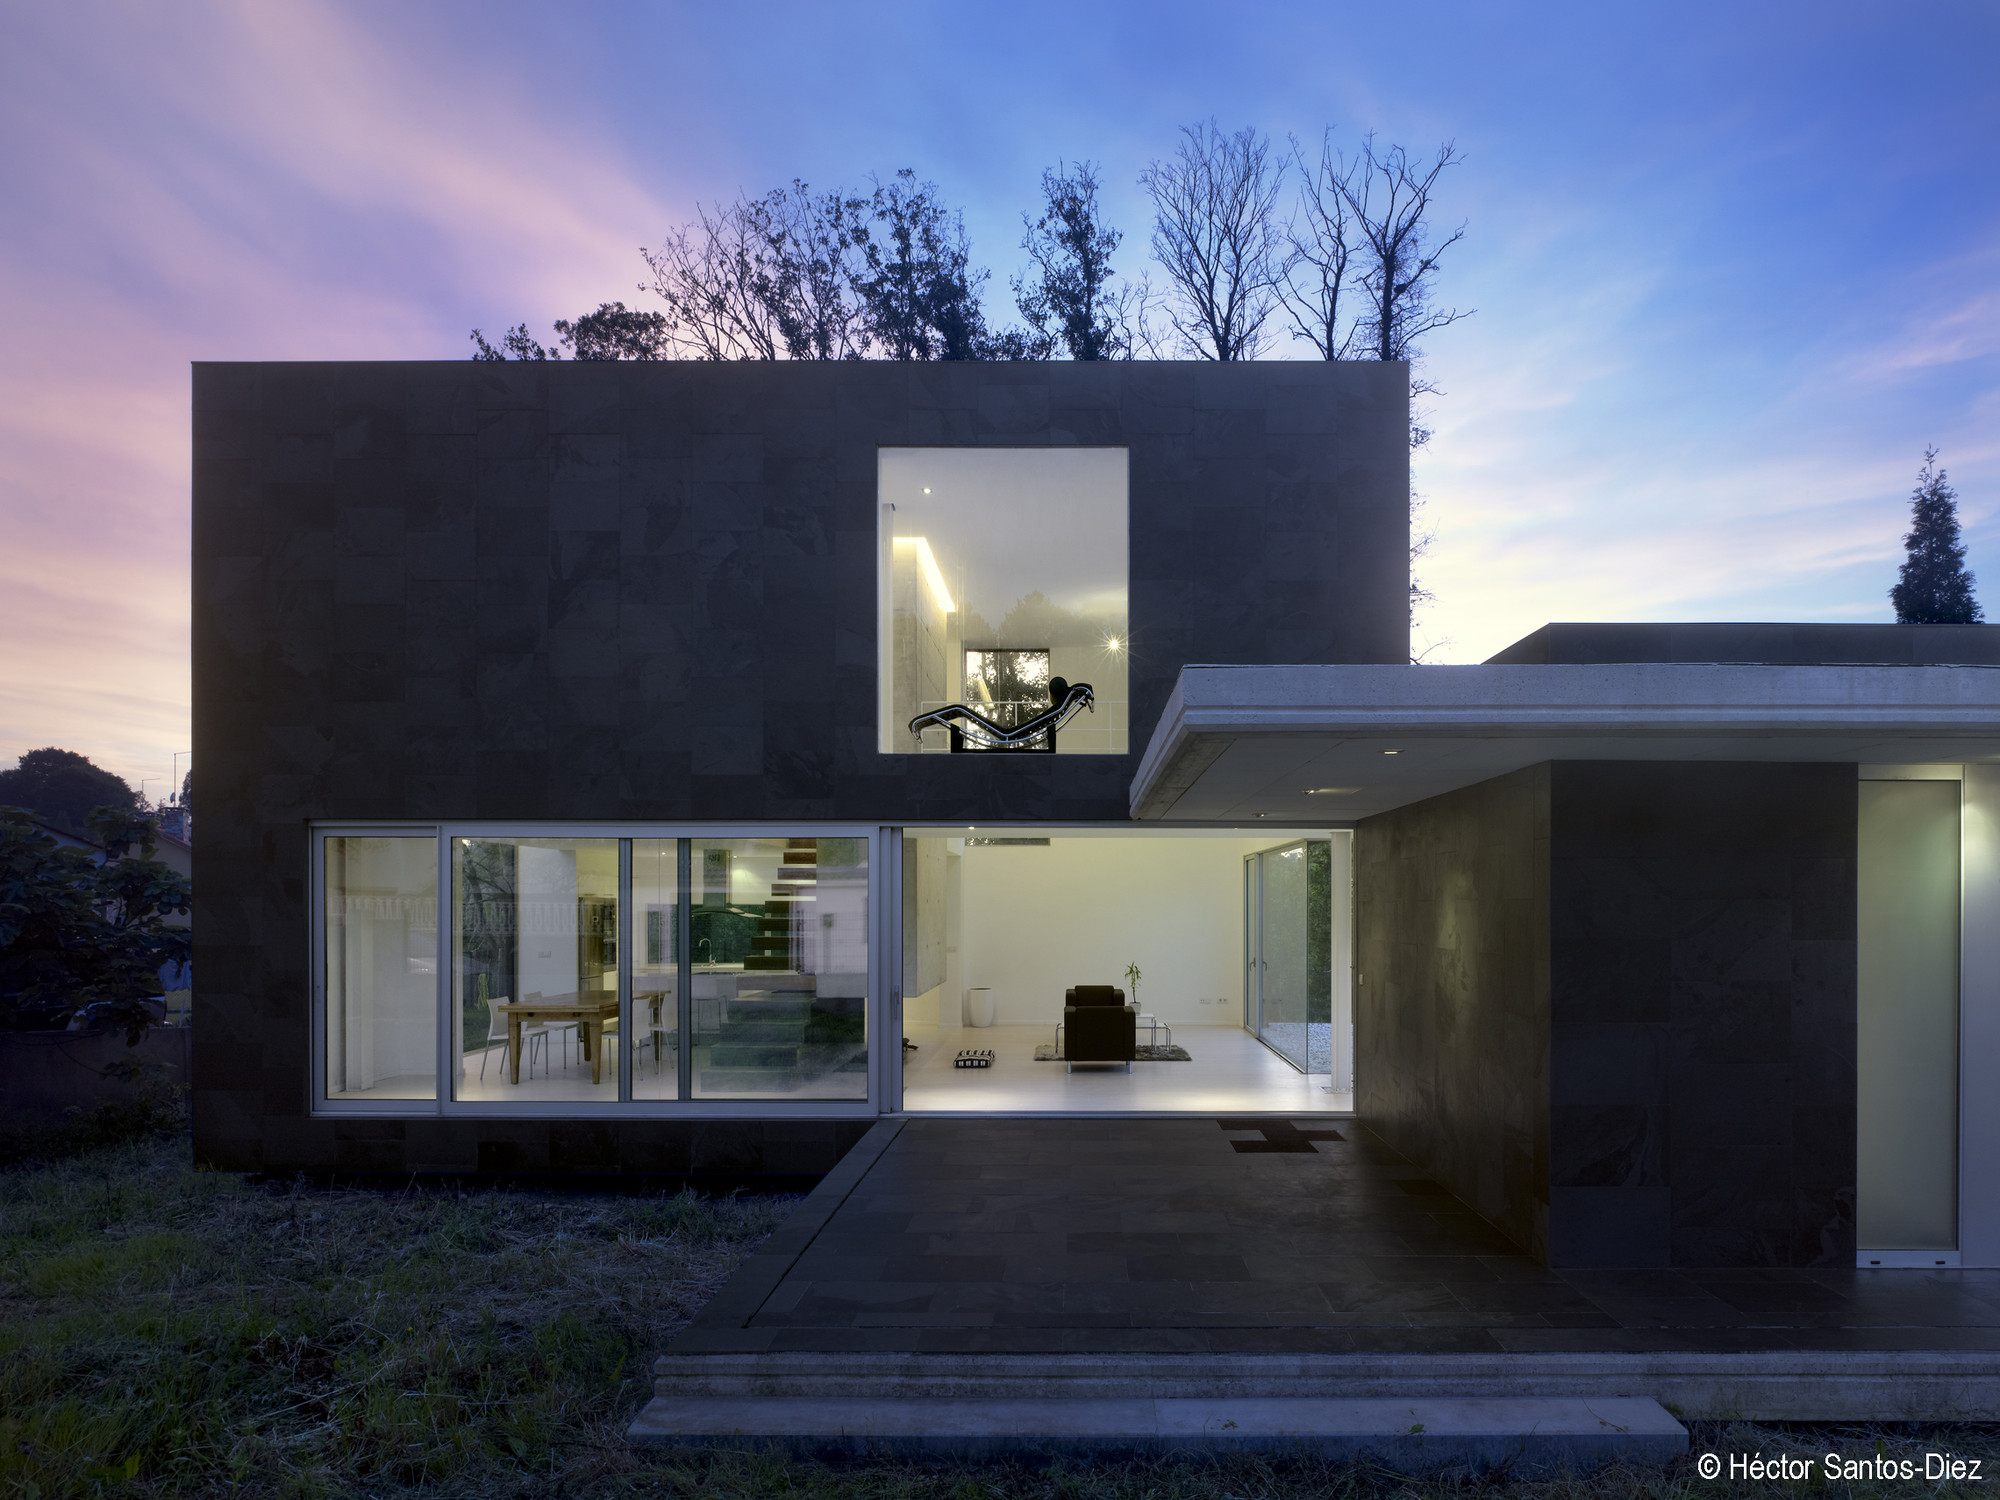 Casa EINS / Óscar Pedrós, © Héctor Santos-Diez